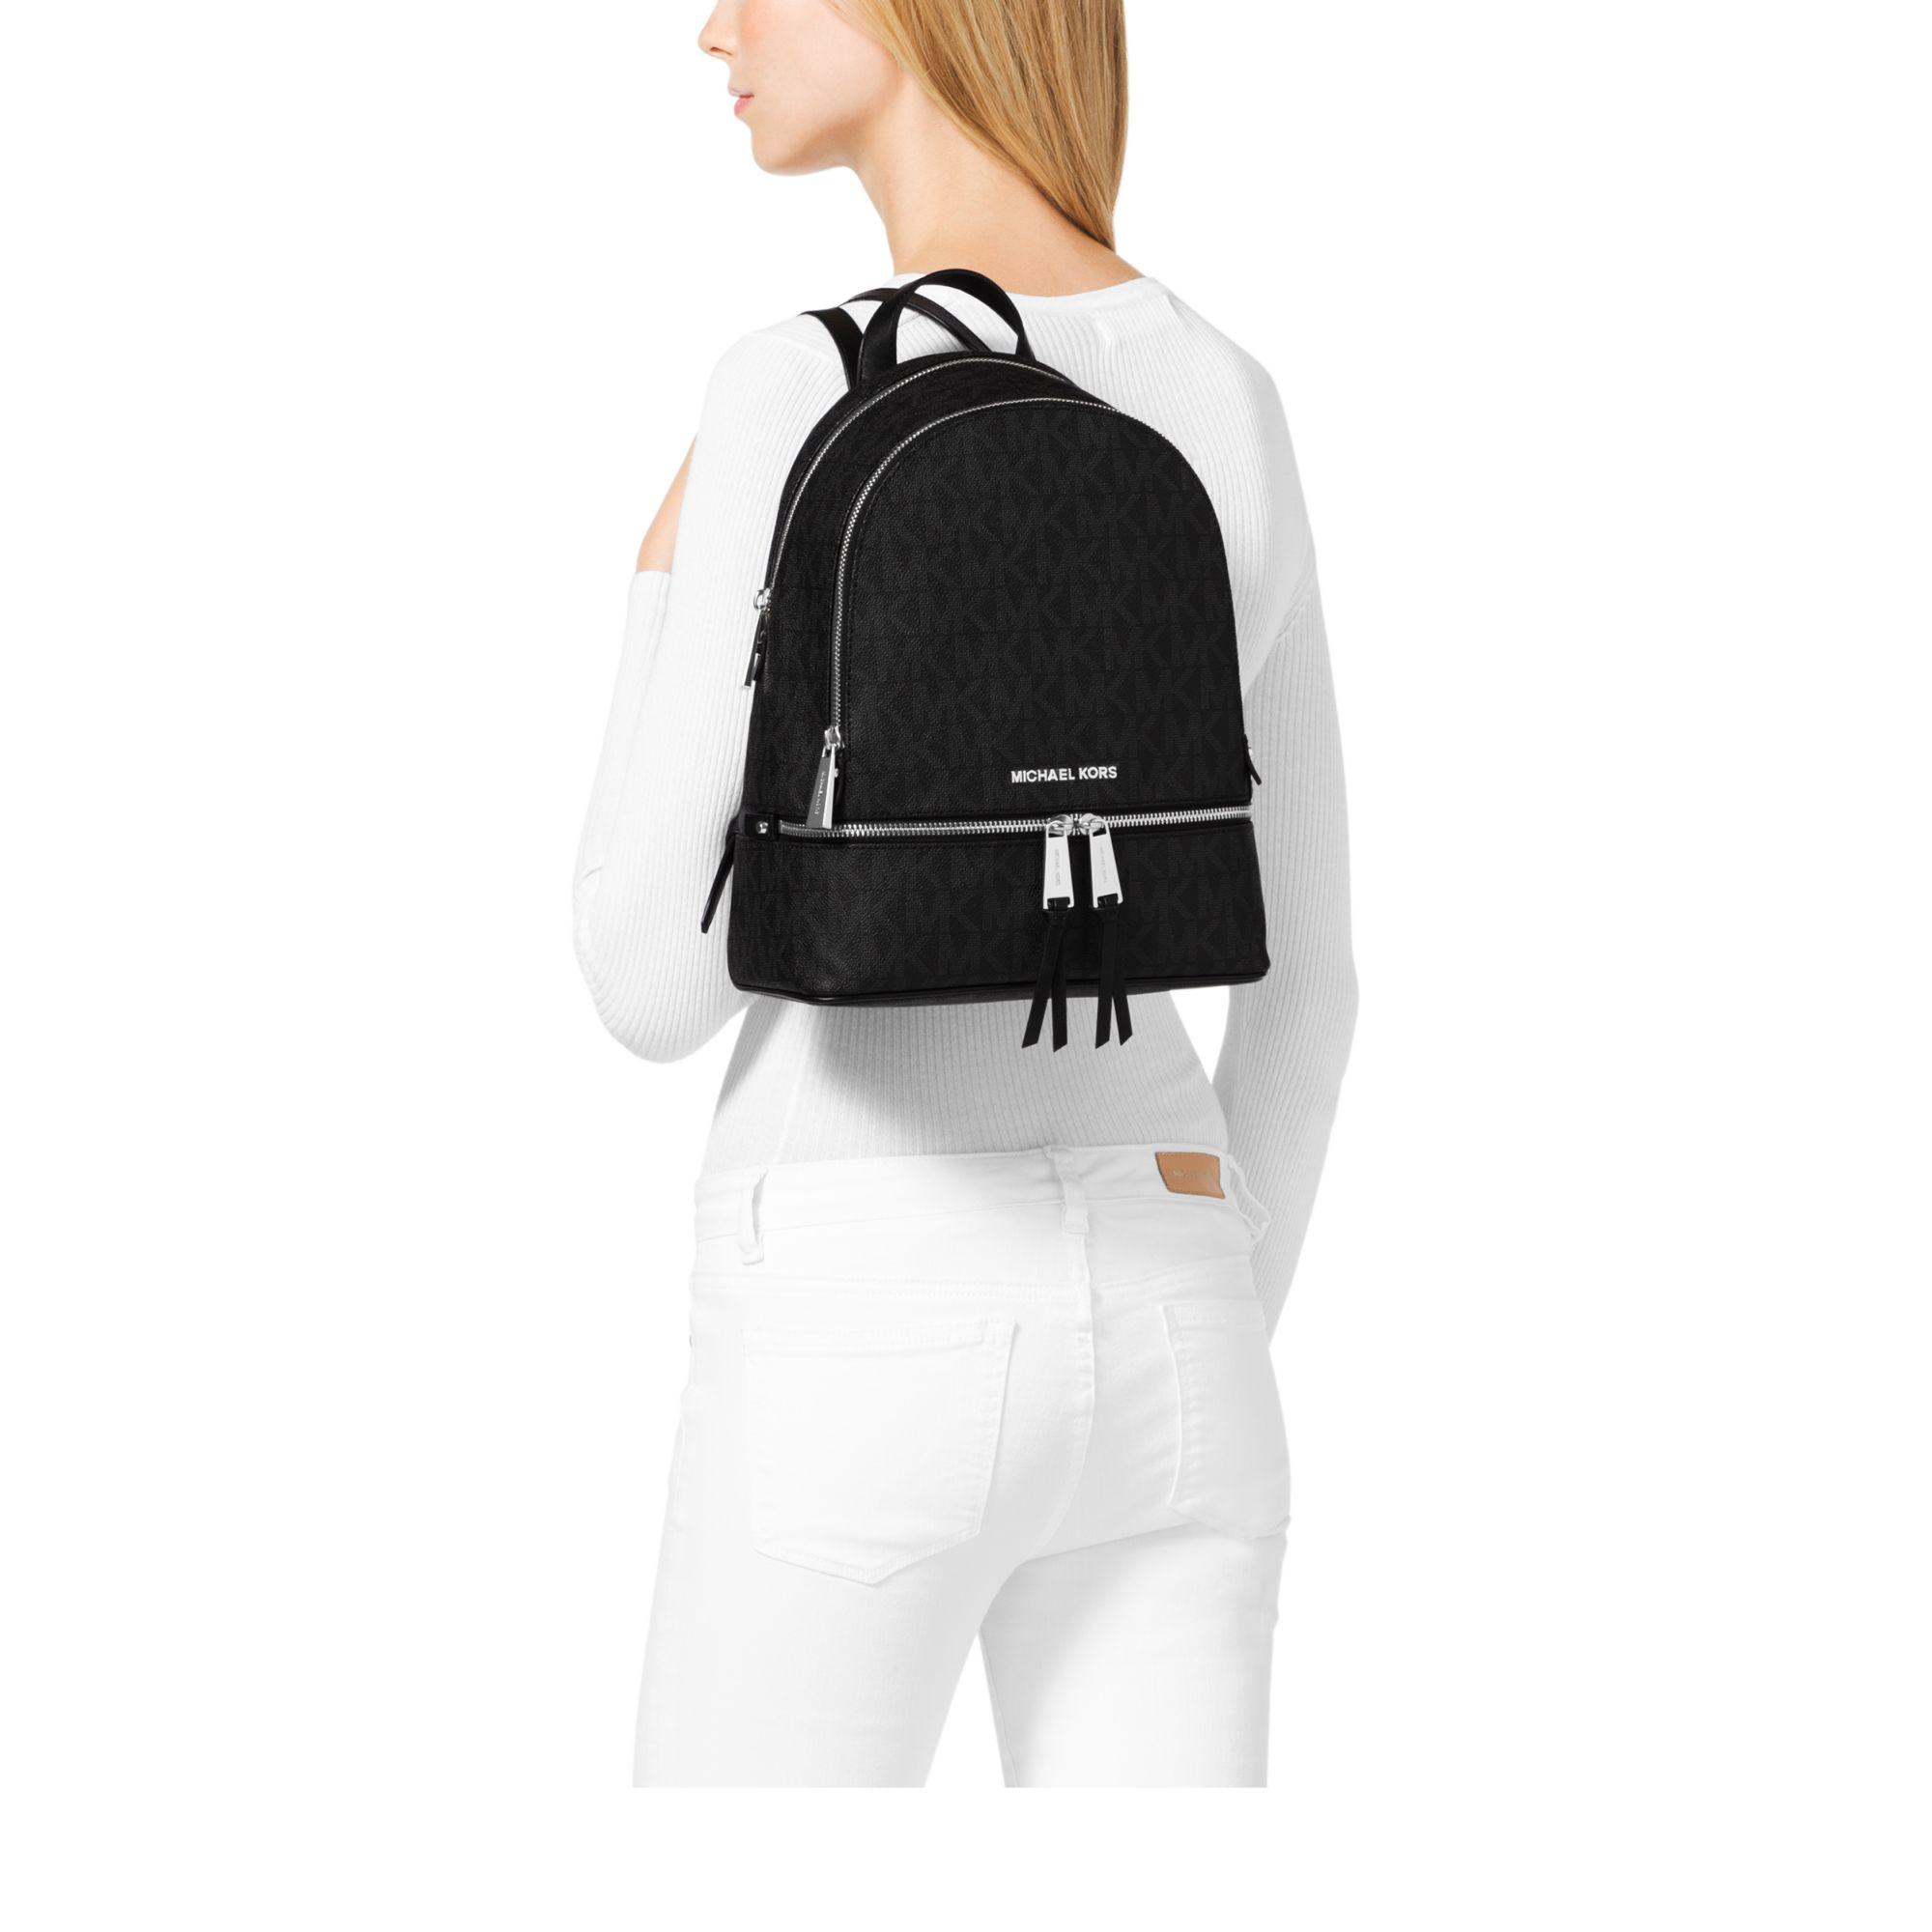 3582c83fb09d Michael Kors Rhea Medium Logo Backpack in Black - Lyst